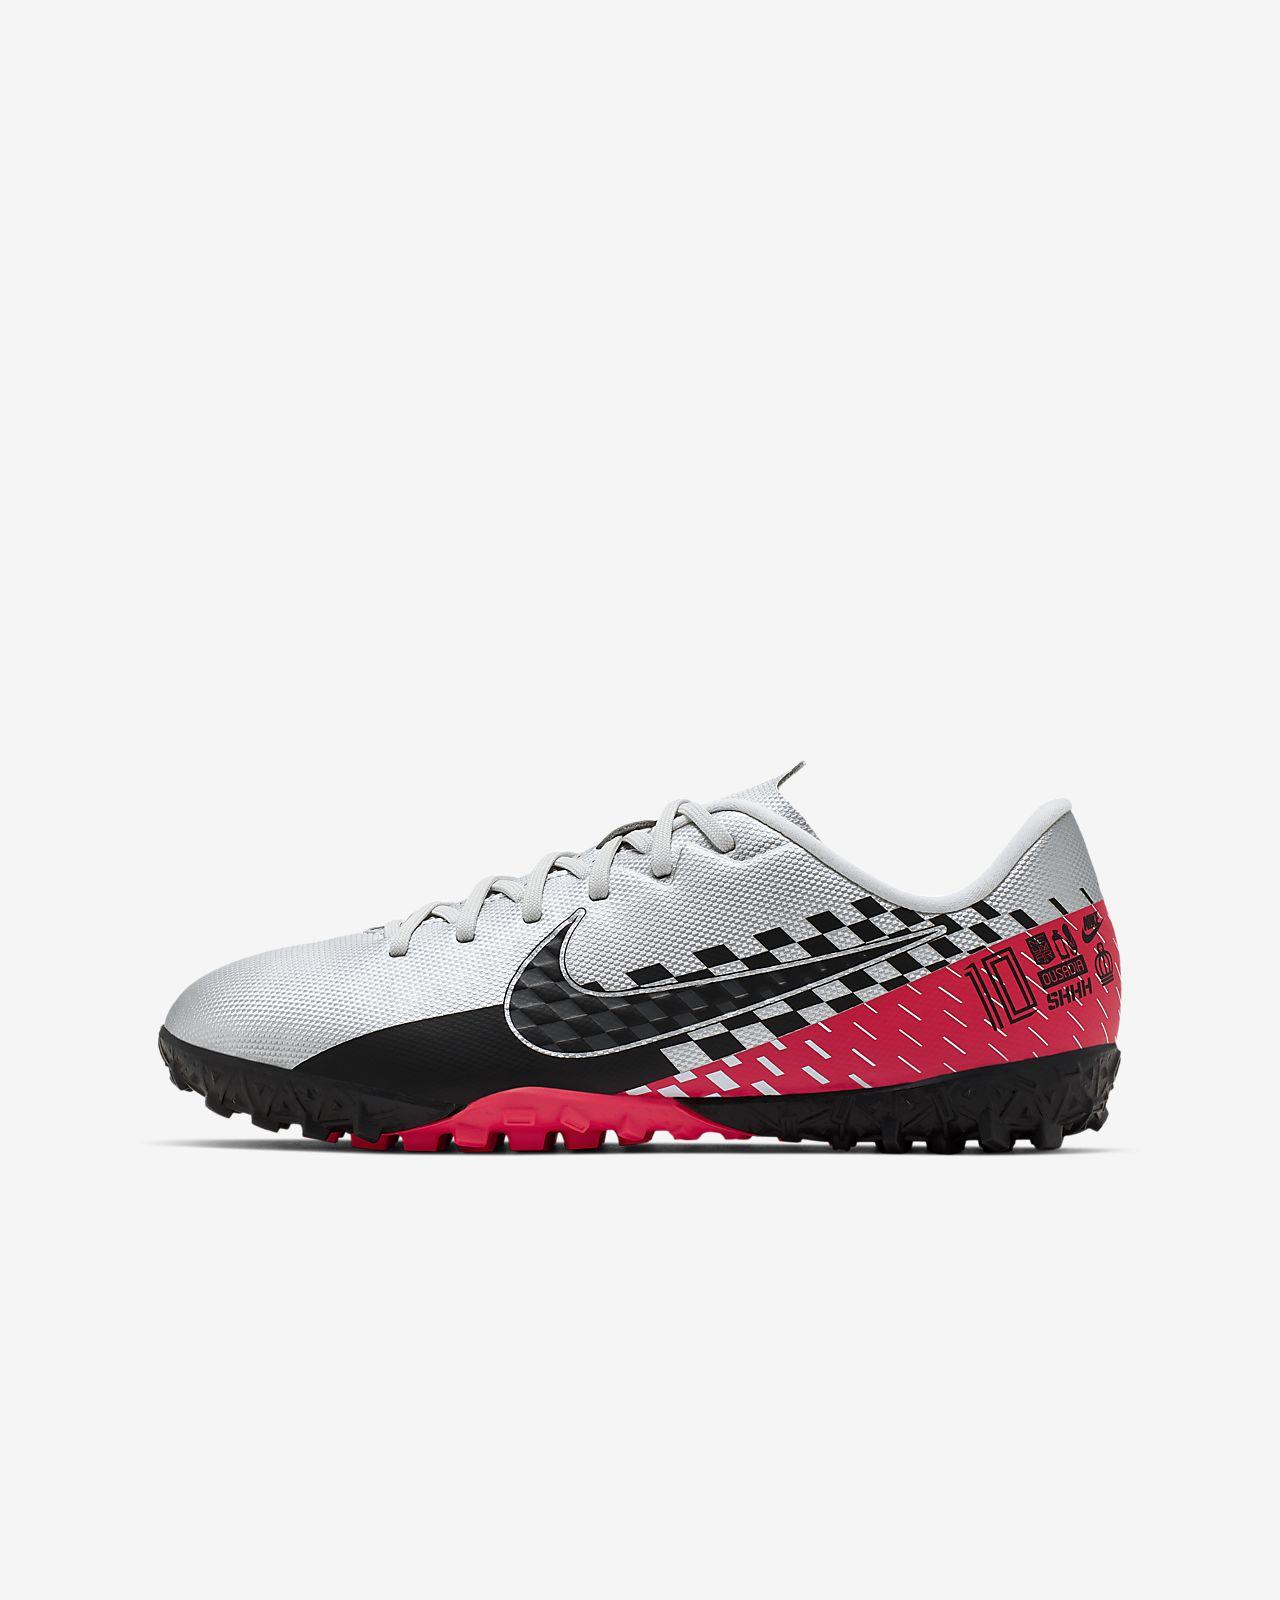 reputable site 28848 cea9e Nike Jr. Mercurial Vapor 13 Academy Neymar Jr. TF Younger/Older Kids'  Artificial-Turf Football Shoe